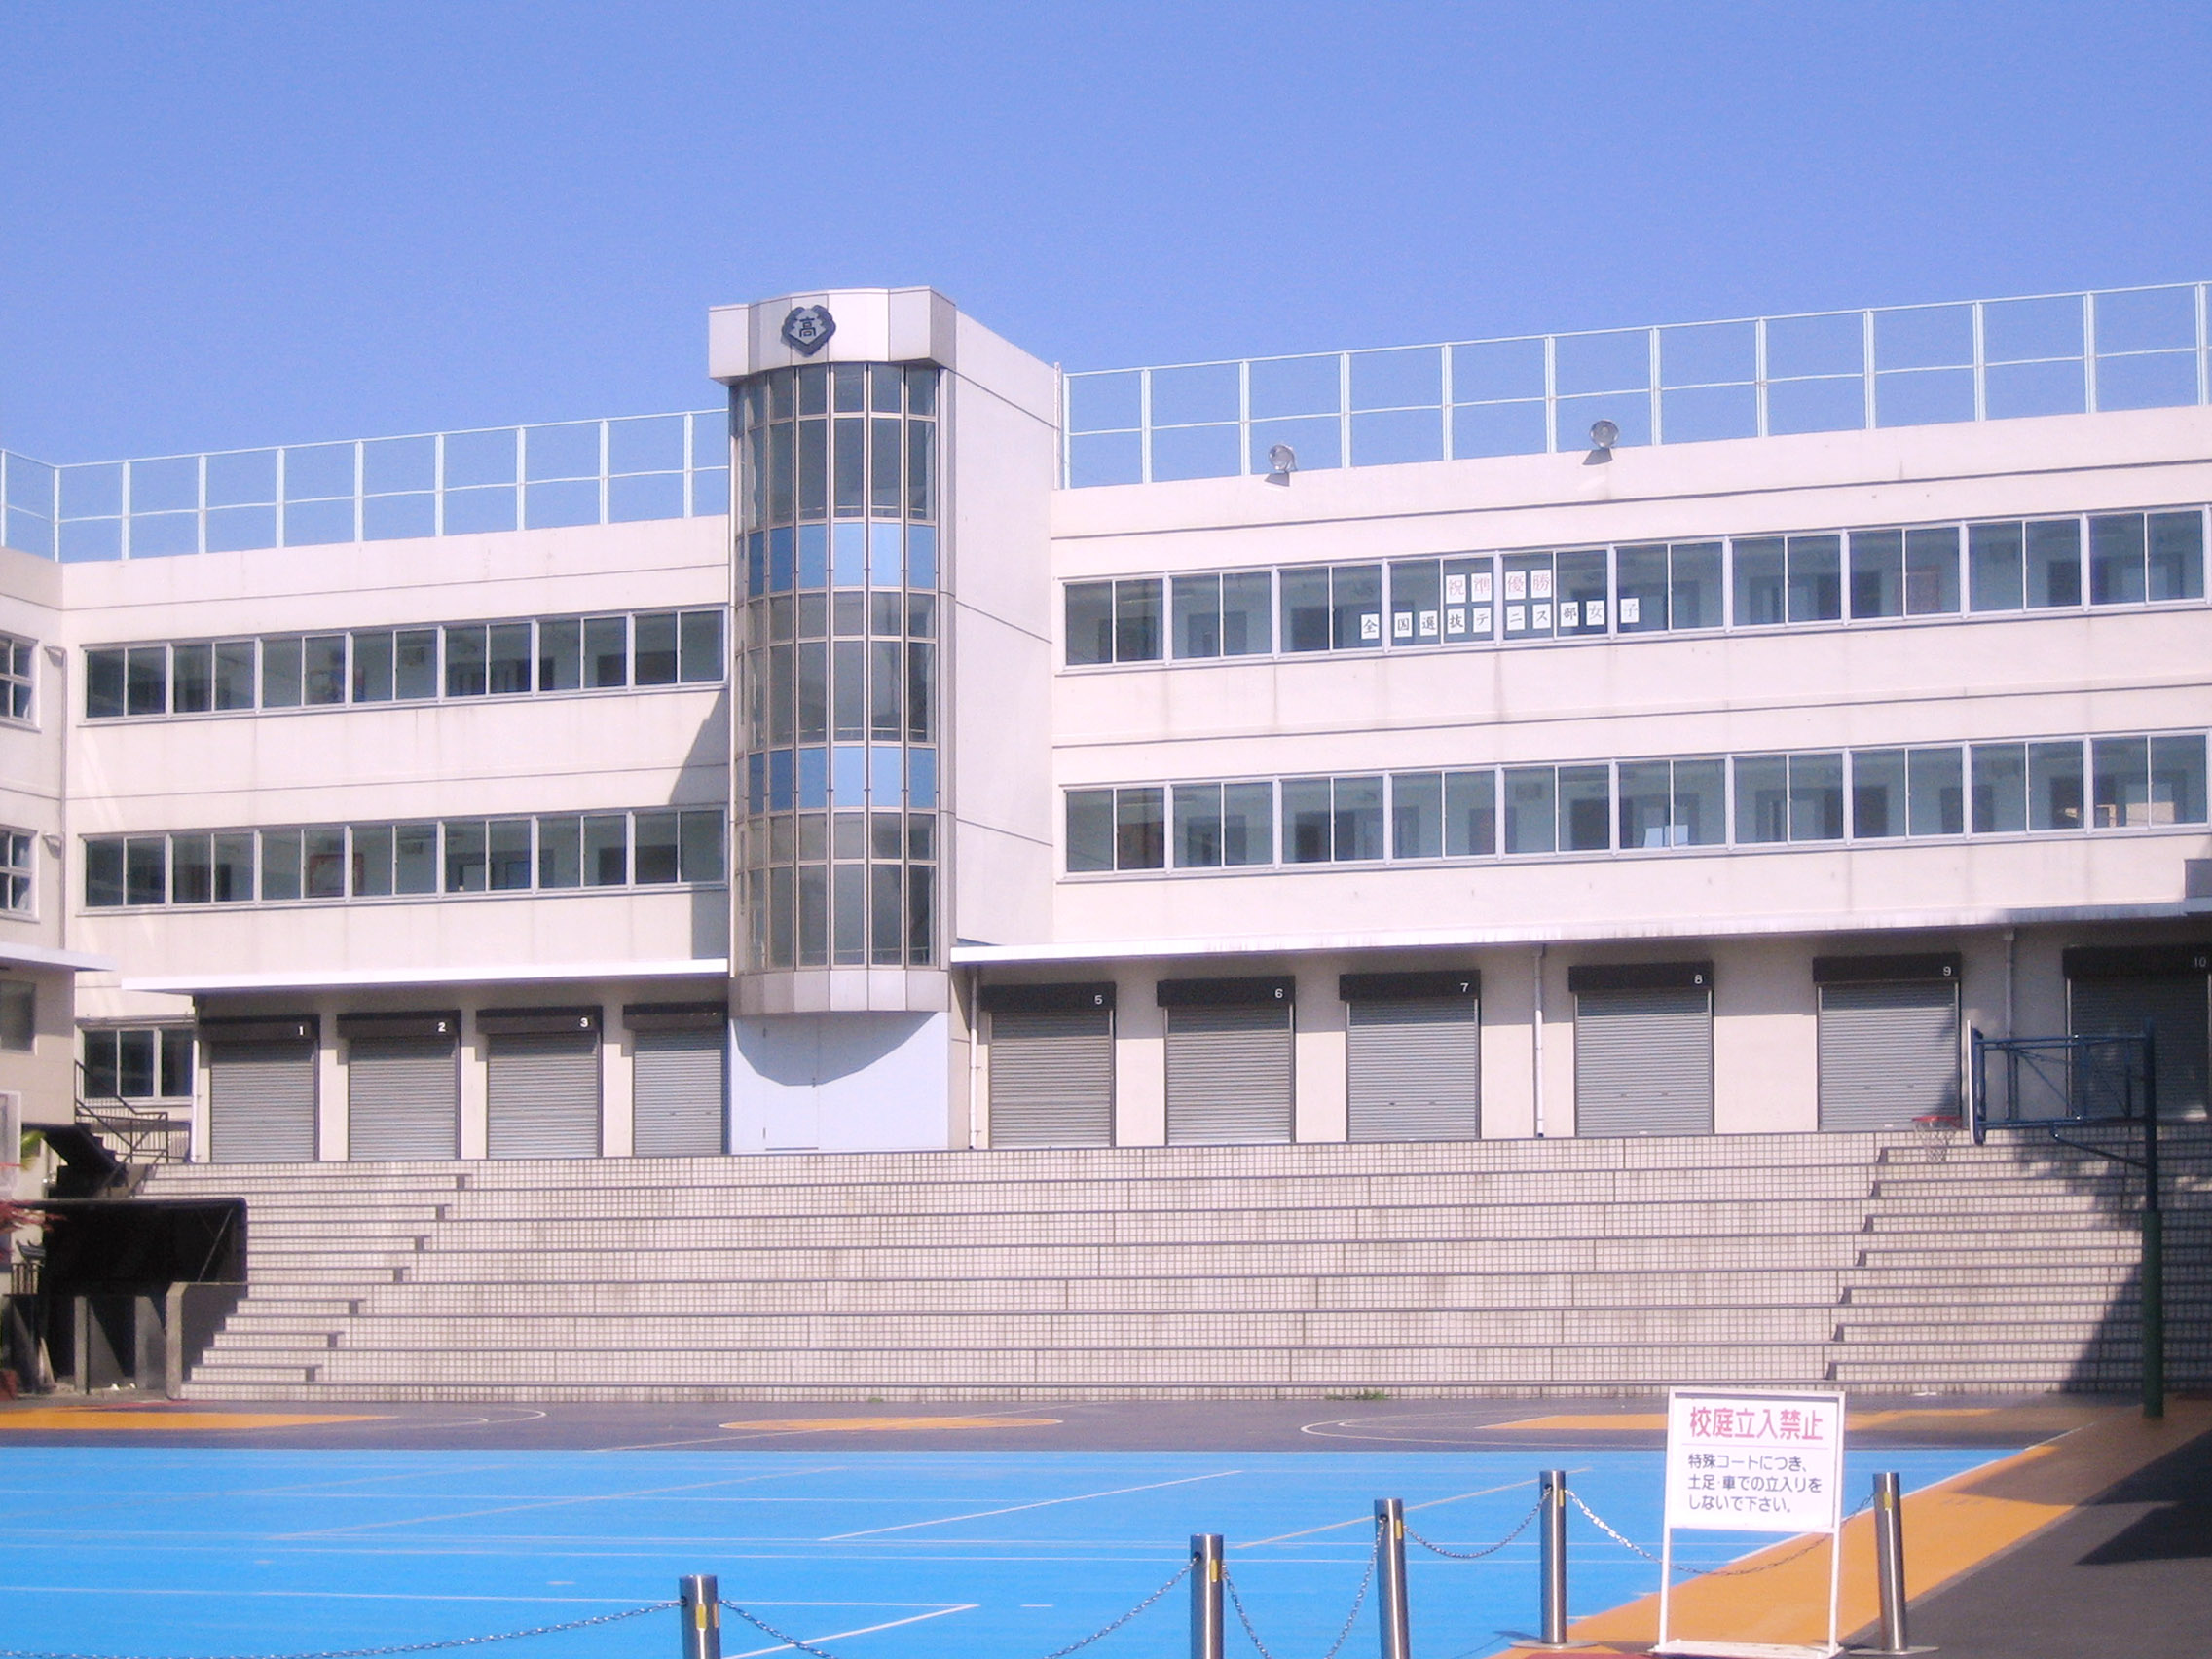 Description horikoshi high school school building